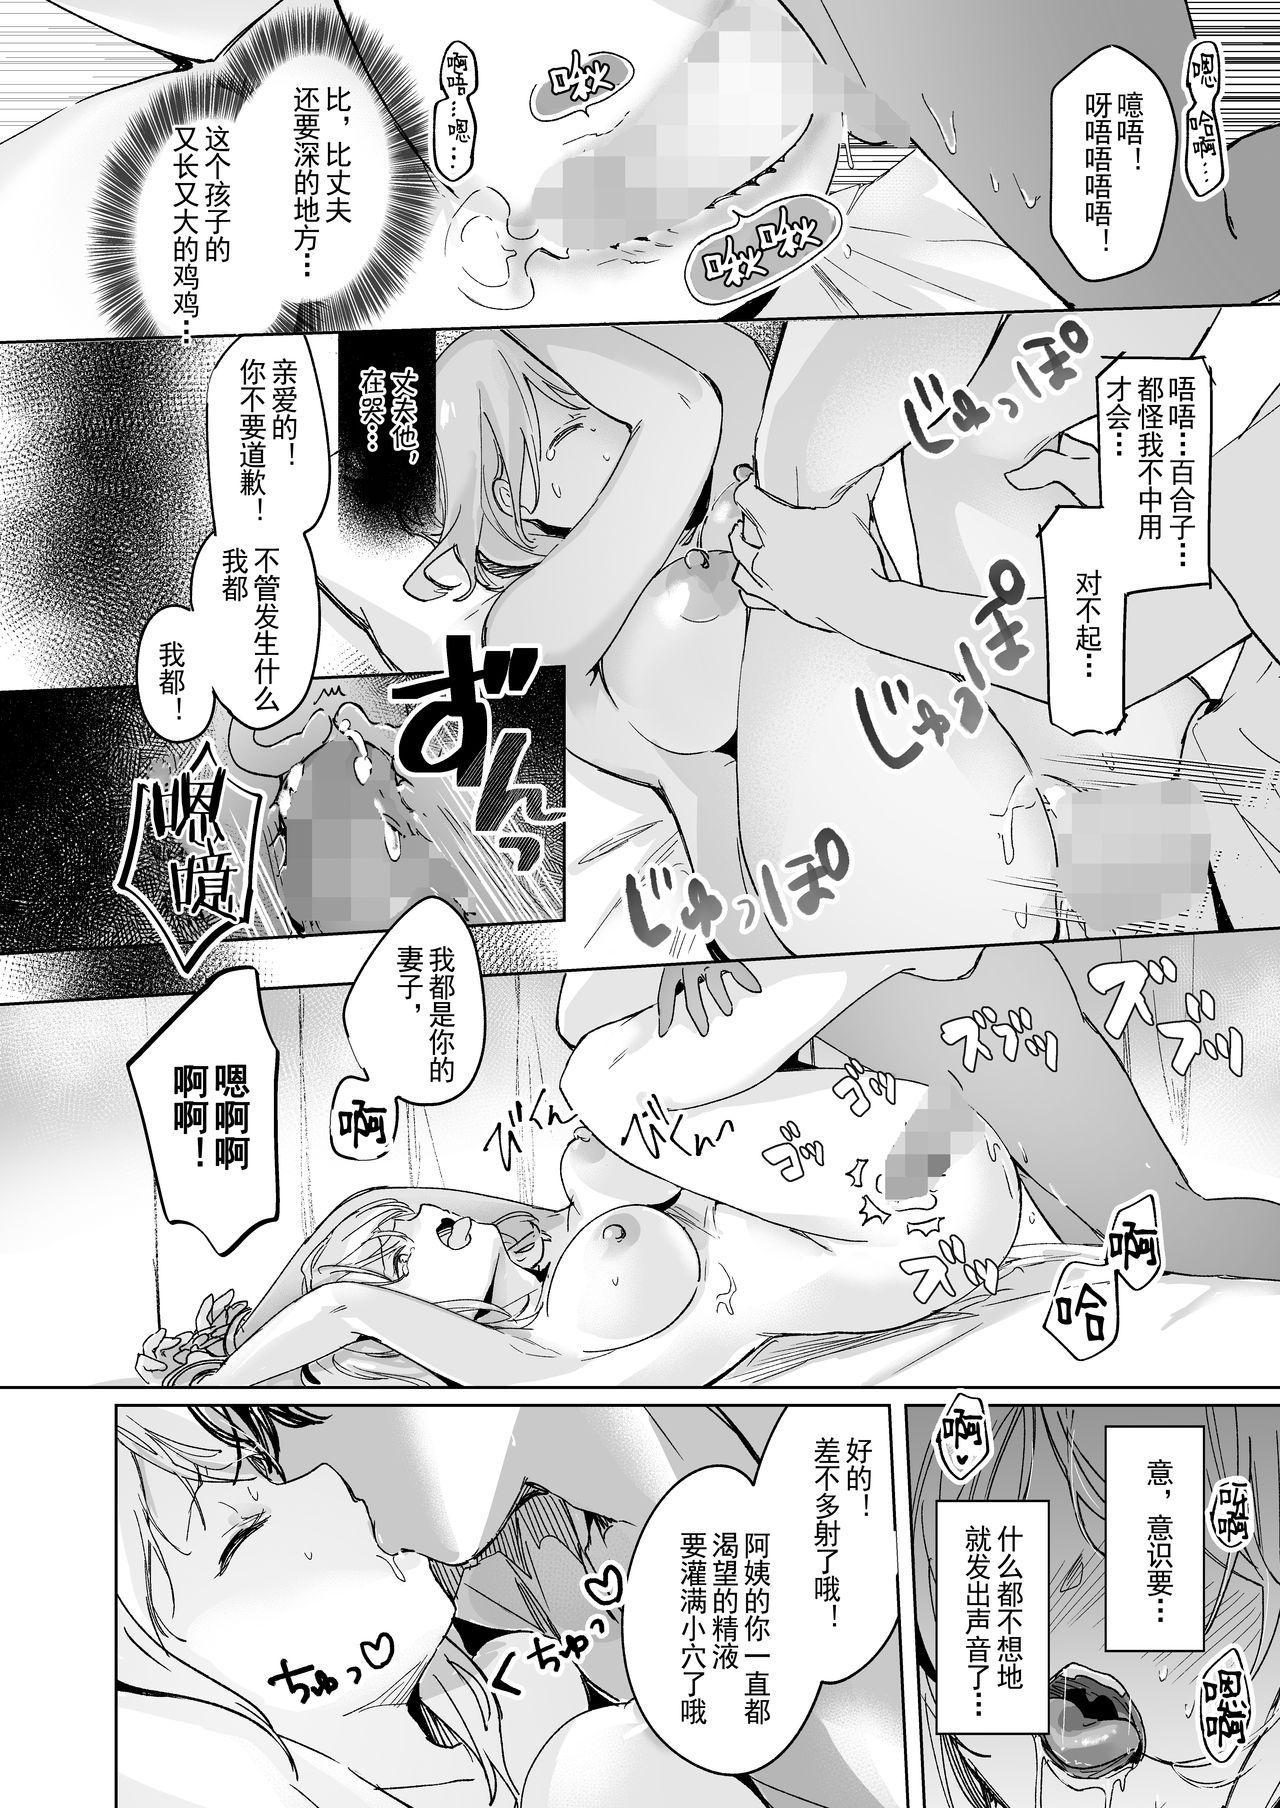 [Yakisoba Pants (Bonbi, Grand Deer)] Shōshika Taisaku de Kinjo no Kusogaki ni Netora Reru Tsuma   Wife Cuckolding By a Neighborhood Brat as a Measure Against the Declining Birthrate[Chinese]【不可视汉化】 18